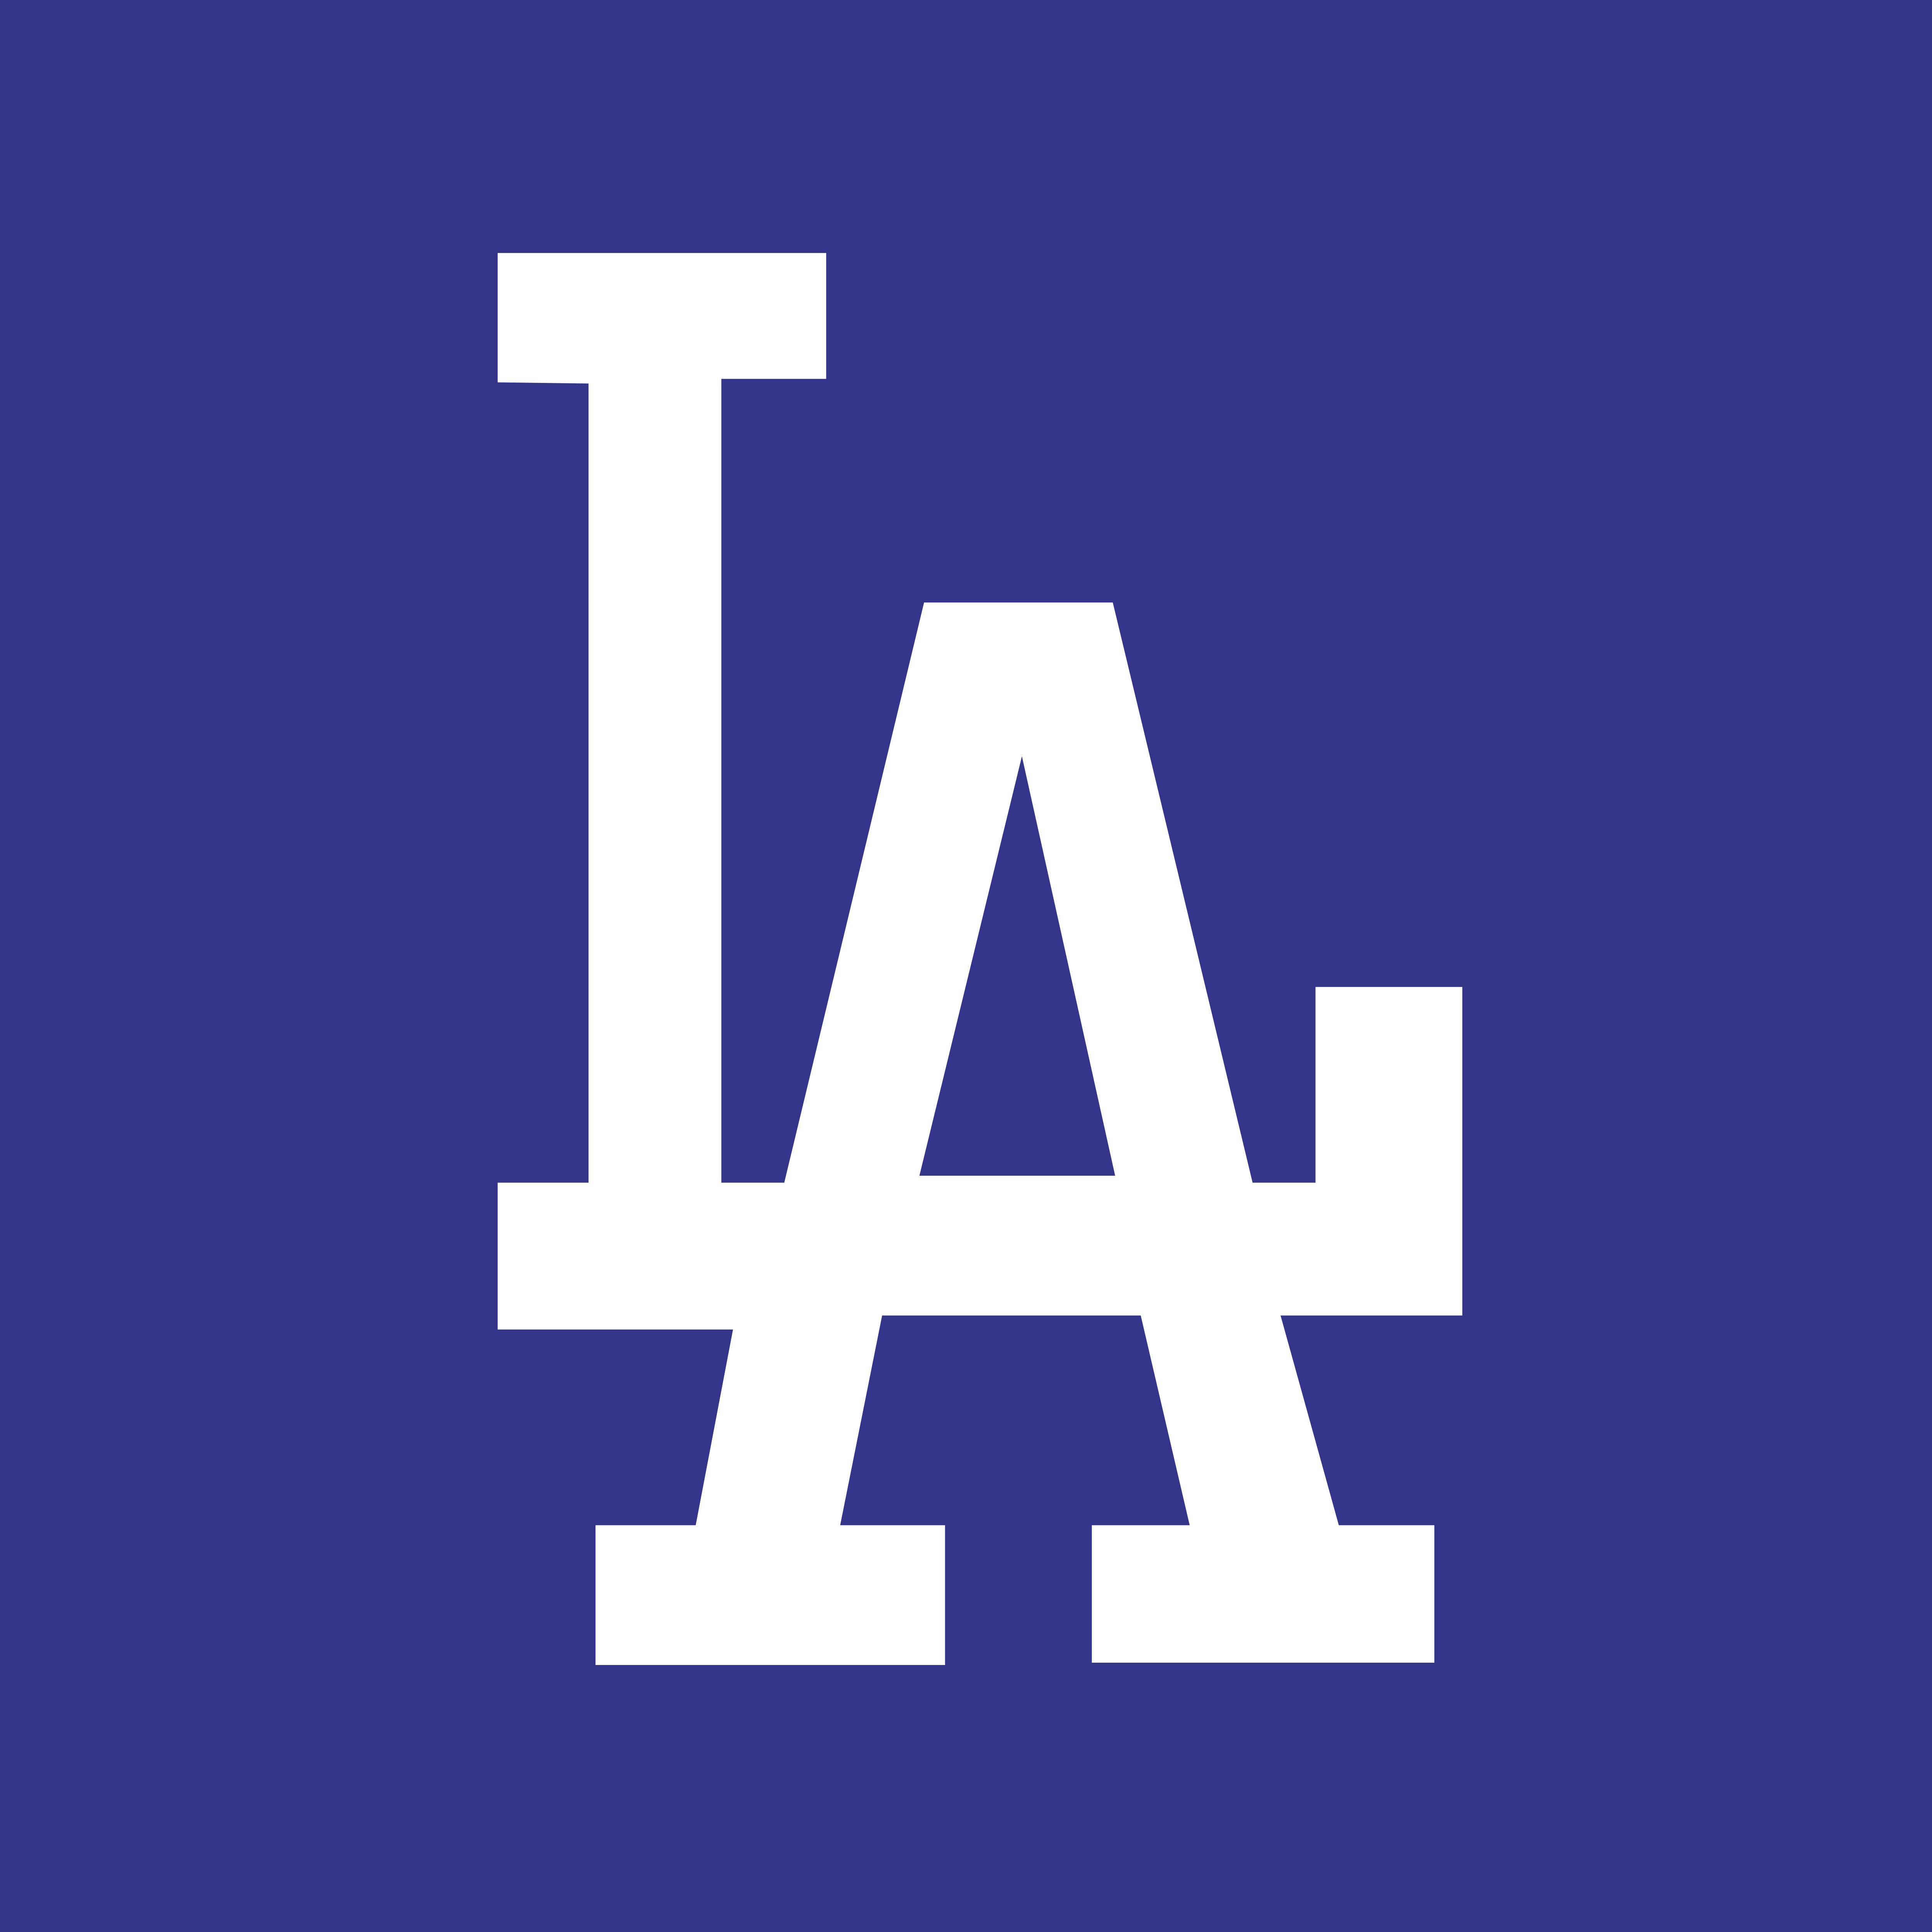 Los Angeles Dodgers Logos Download